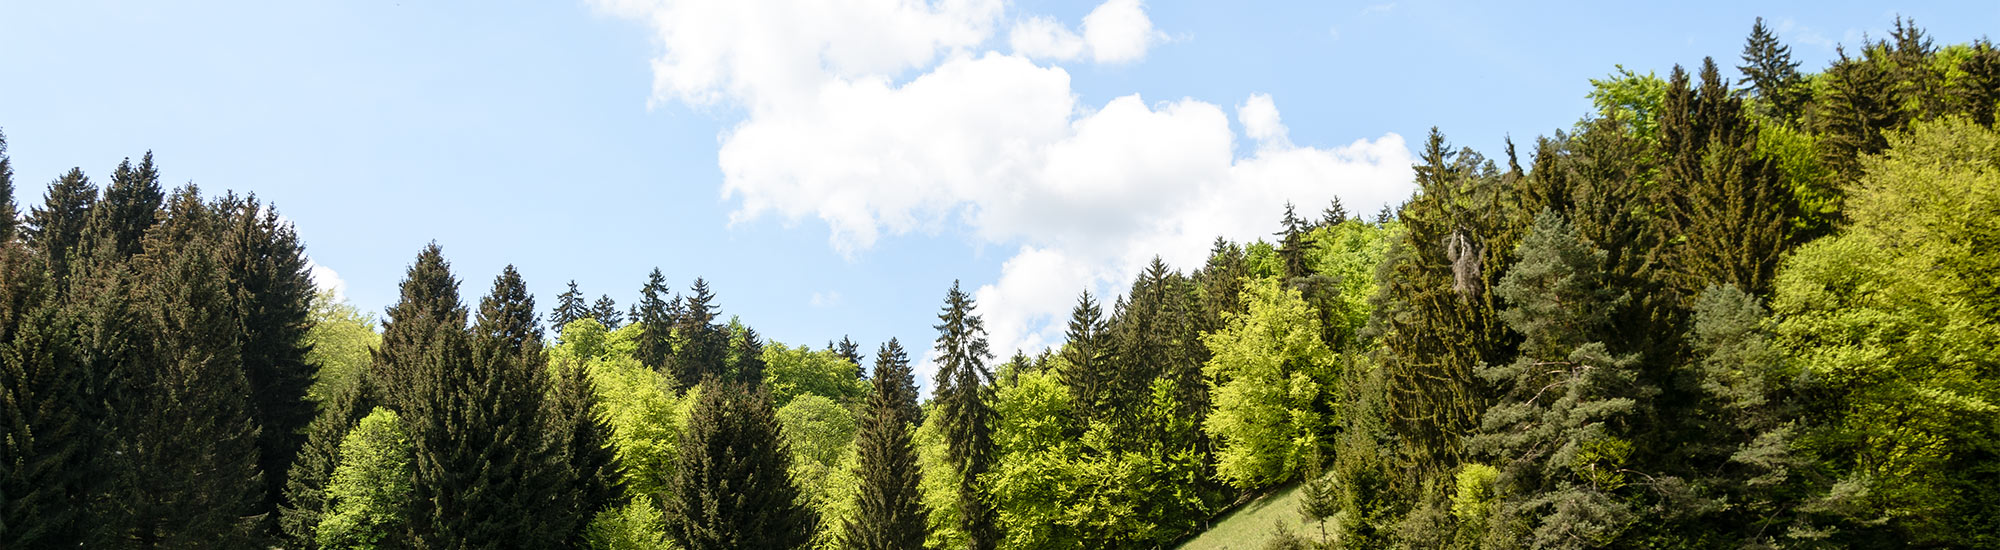 Naturpark-Altmuehltal3